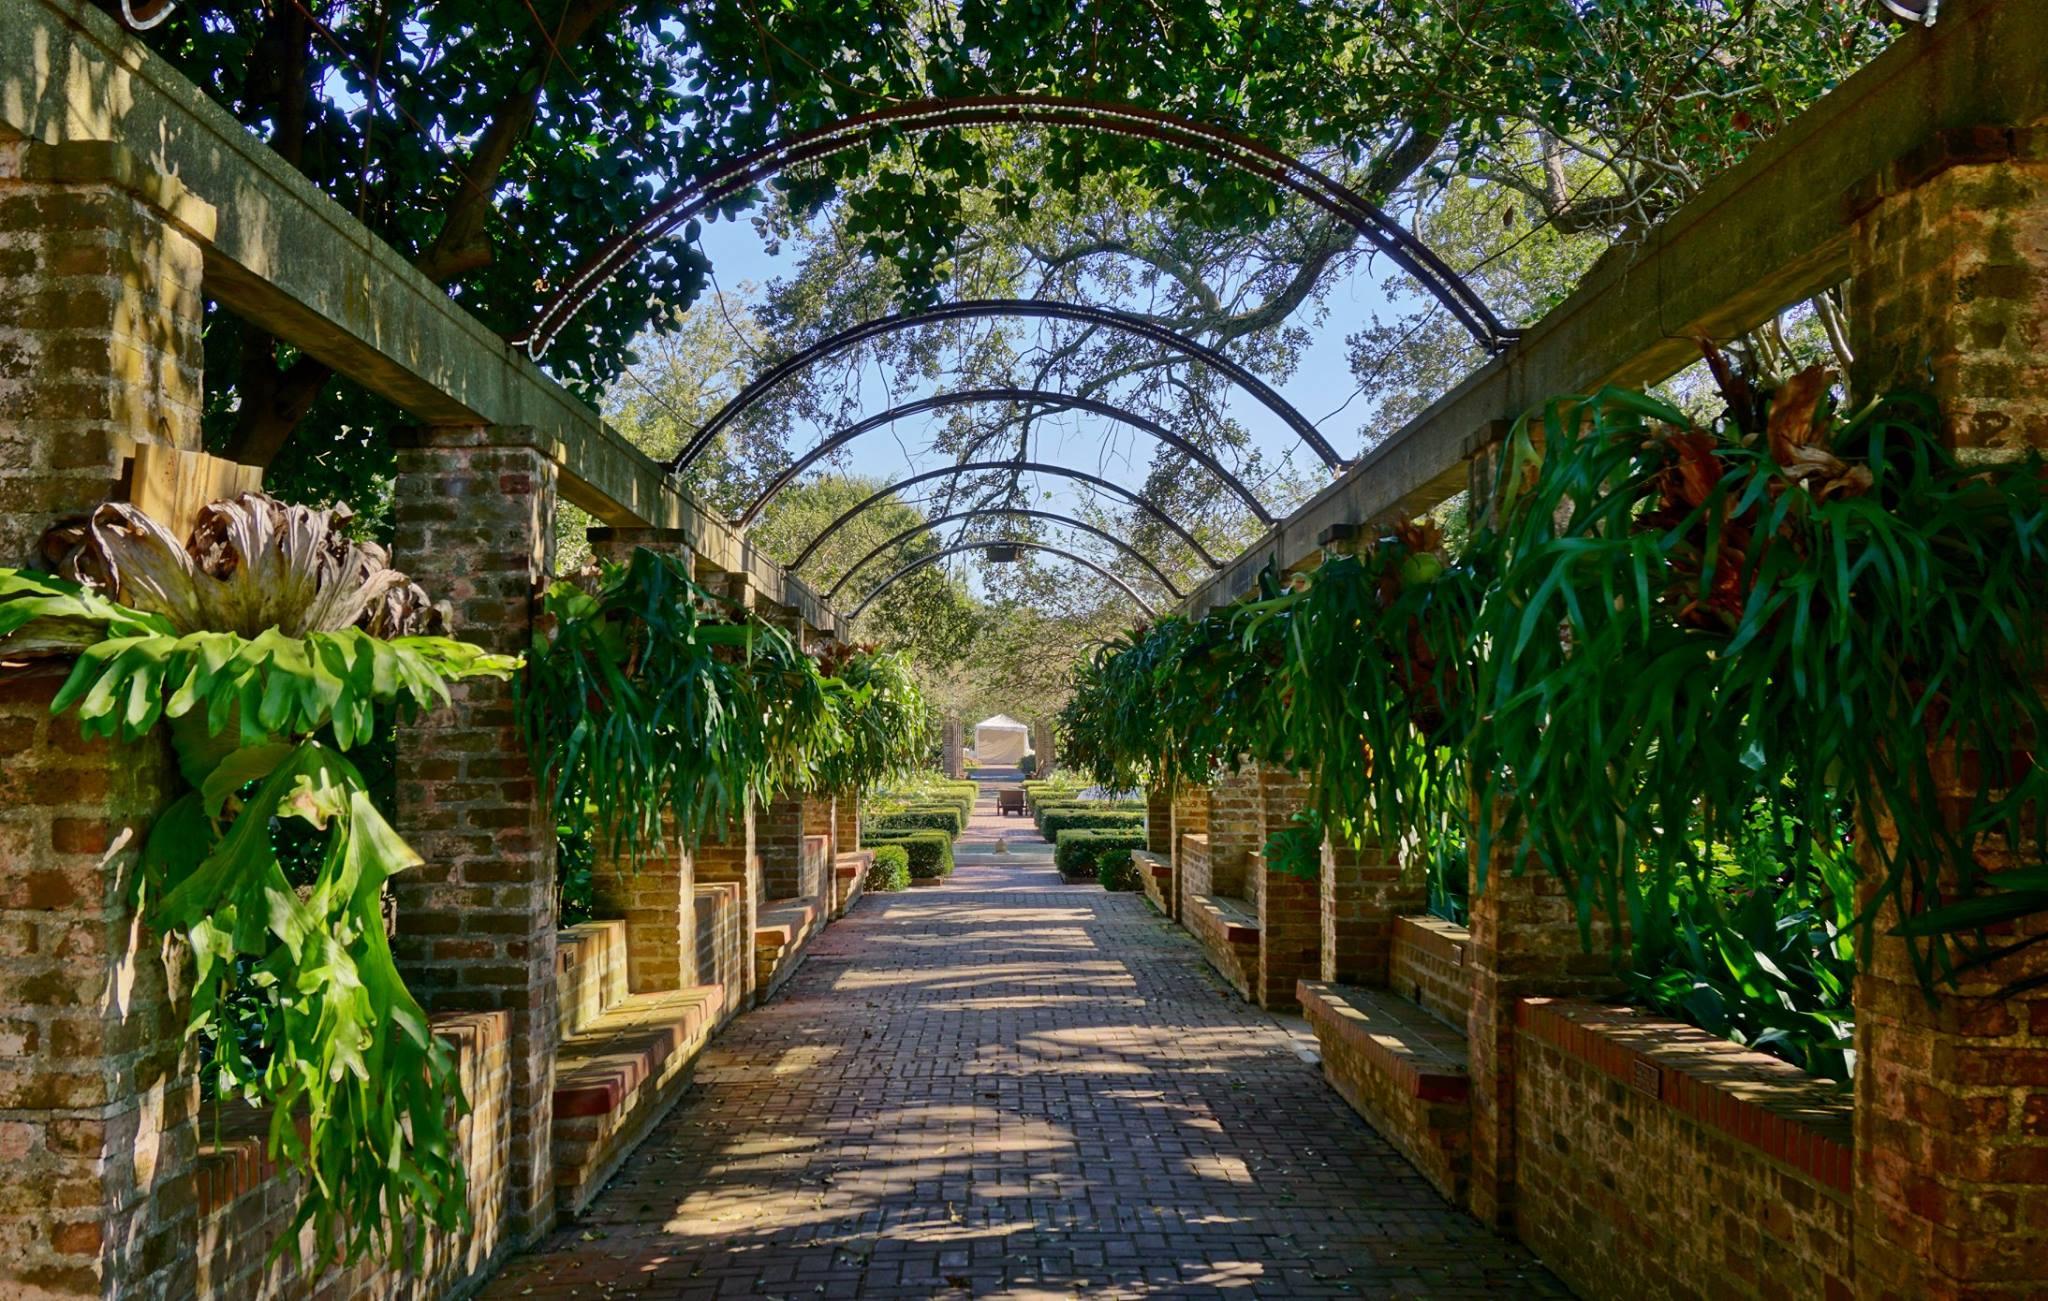 City Park Botanical Gardens In New Orleans Looks Like Narnia